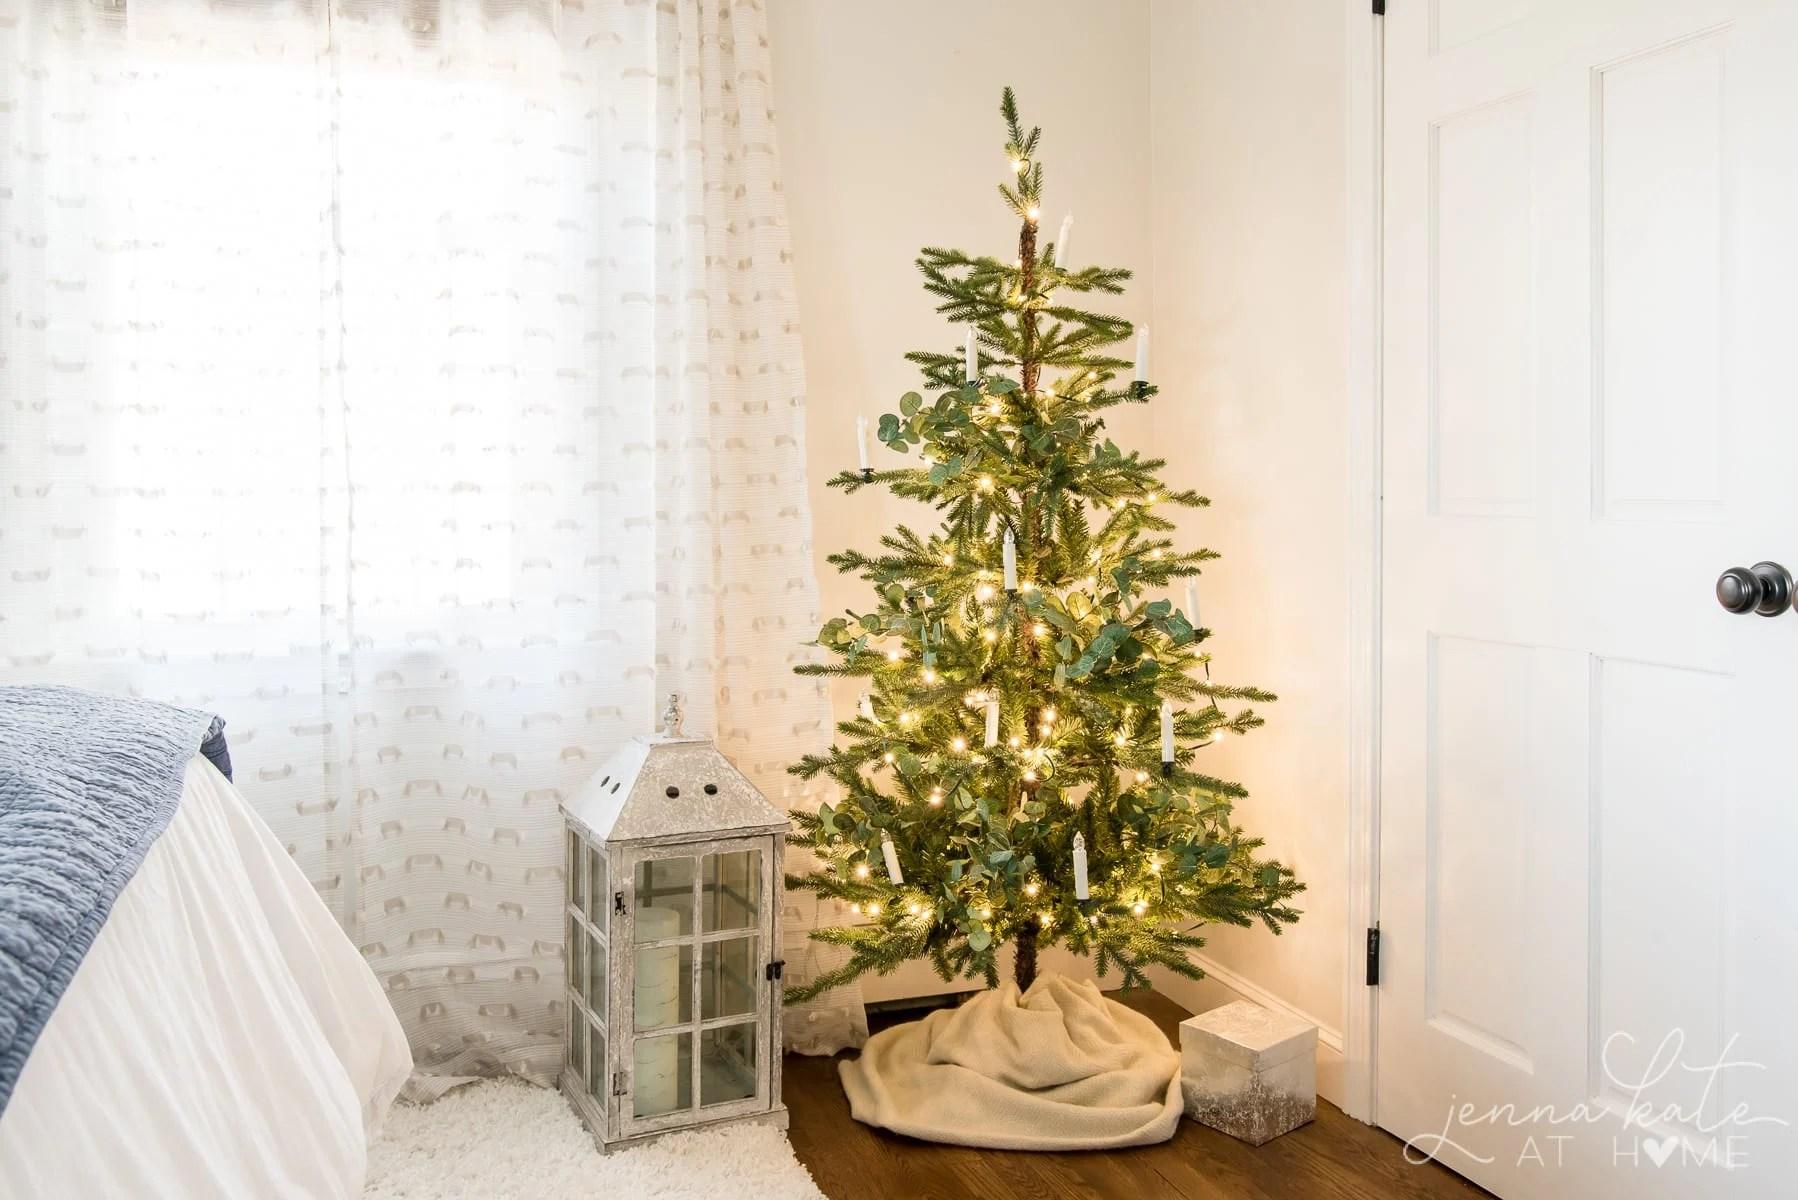 Minimalist, Scandinavian style Christmas tree in a bedroom